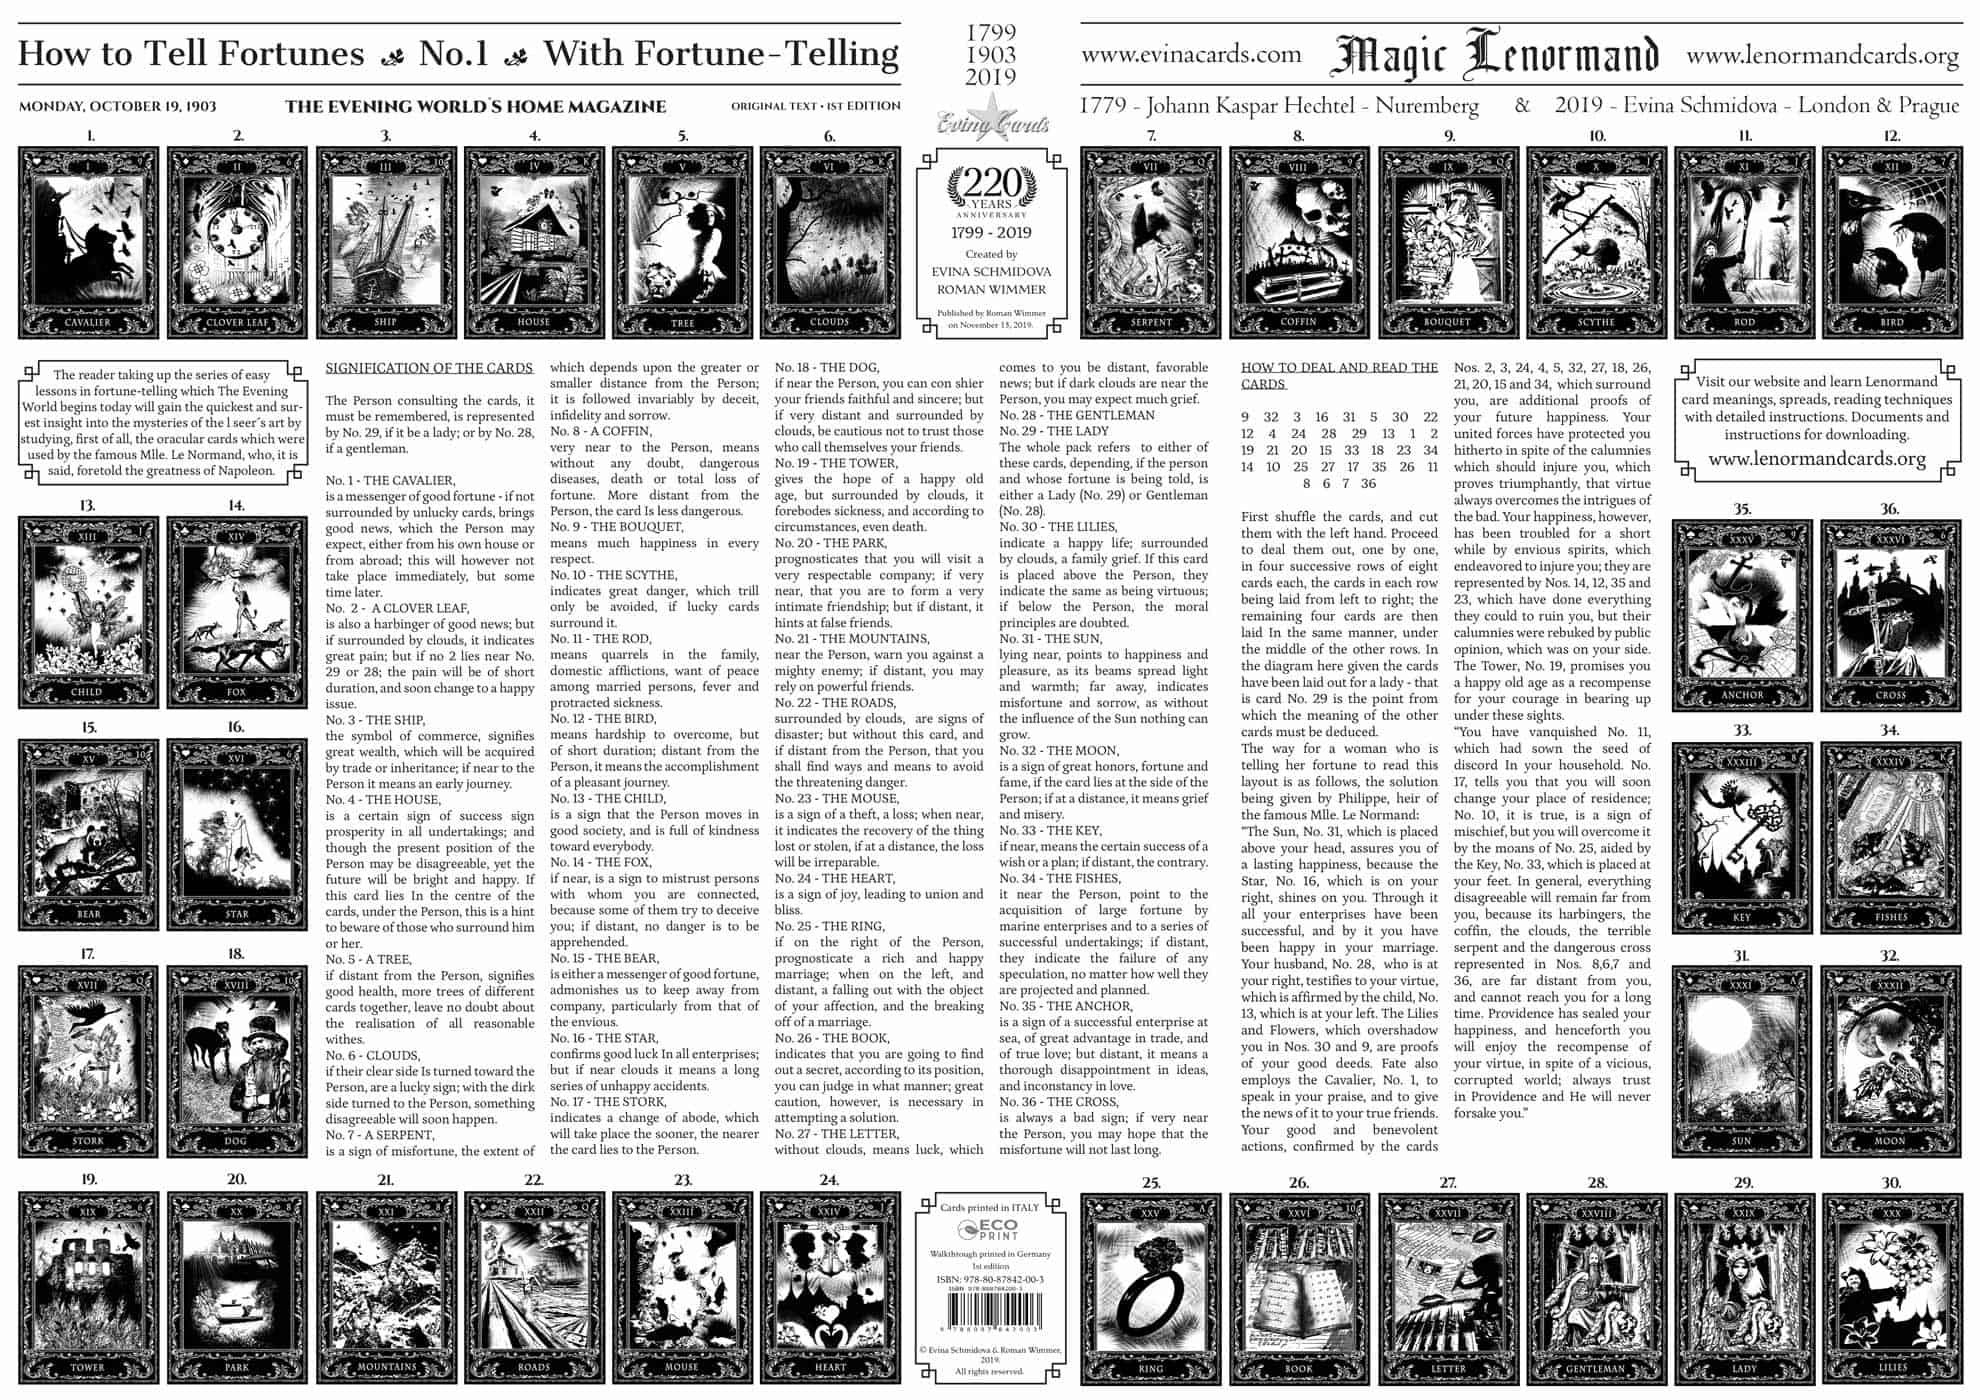 Magic-Lenormand-Cards-1799-1903-2019